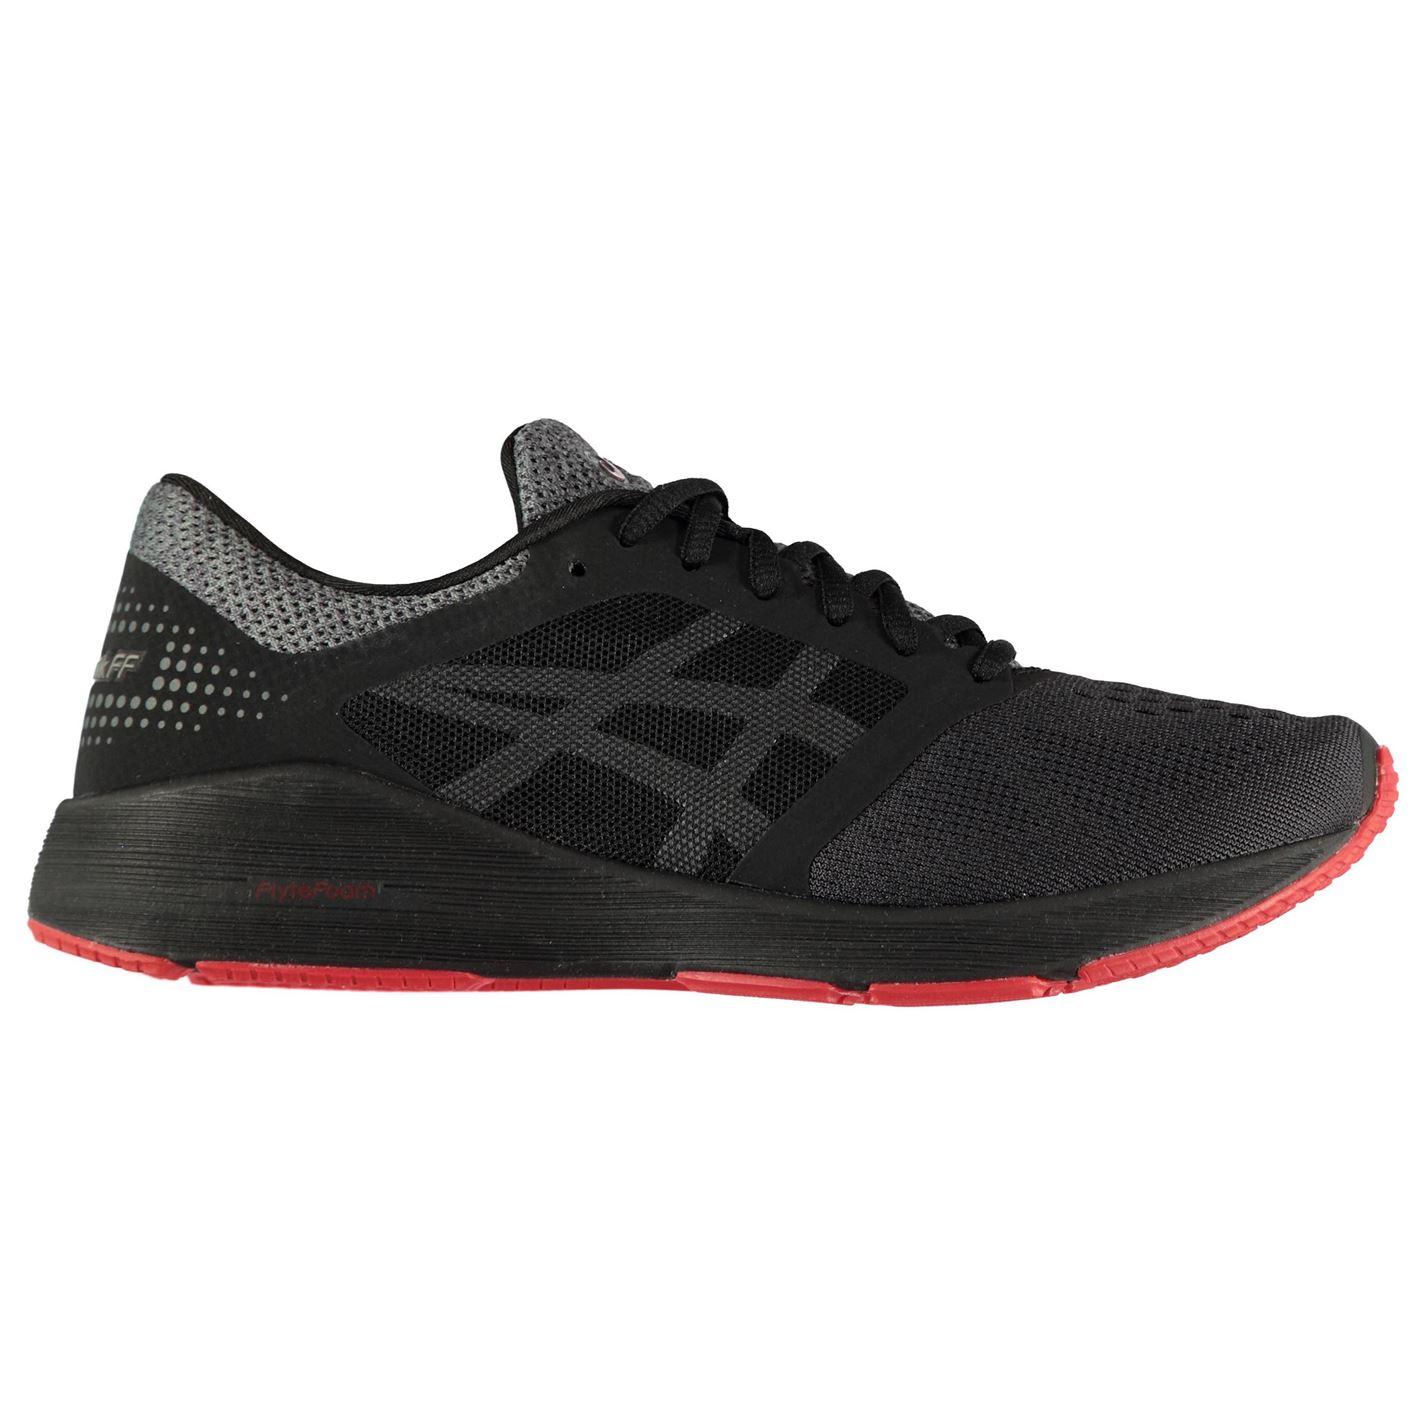 Asics RoadHawk FF pánske bežecké topánky